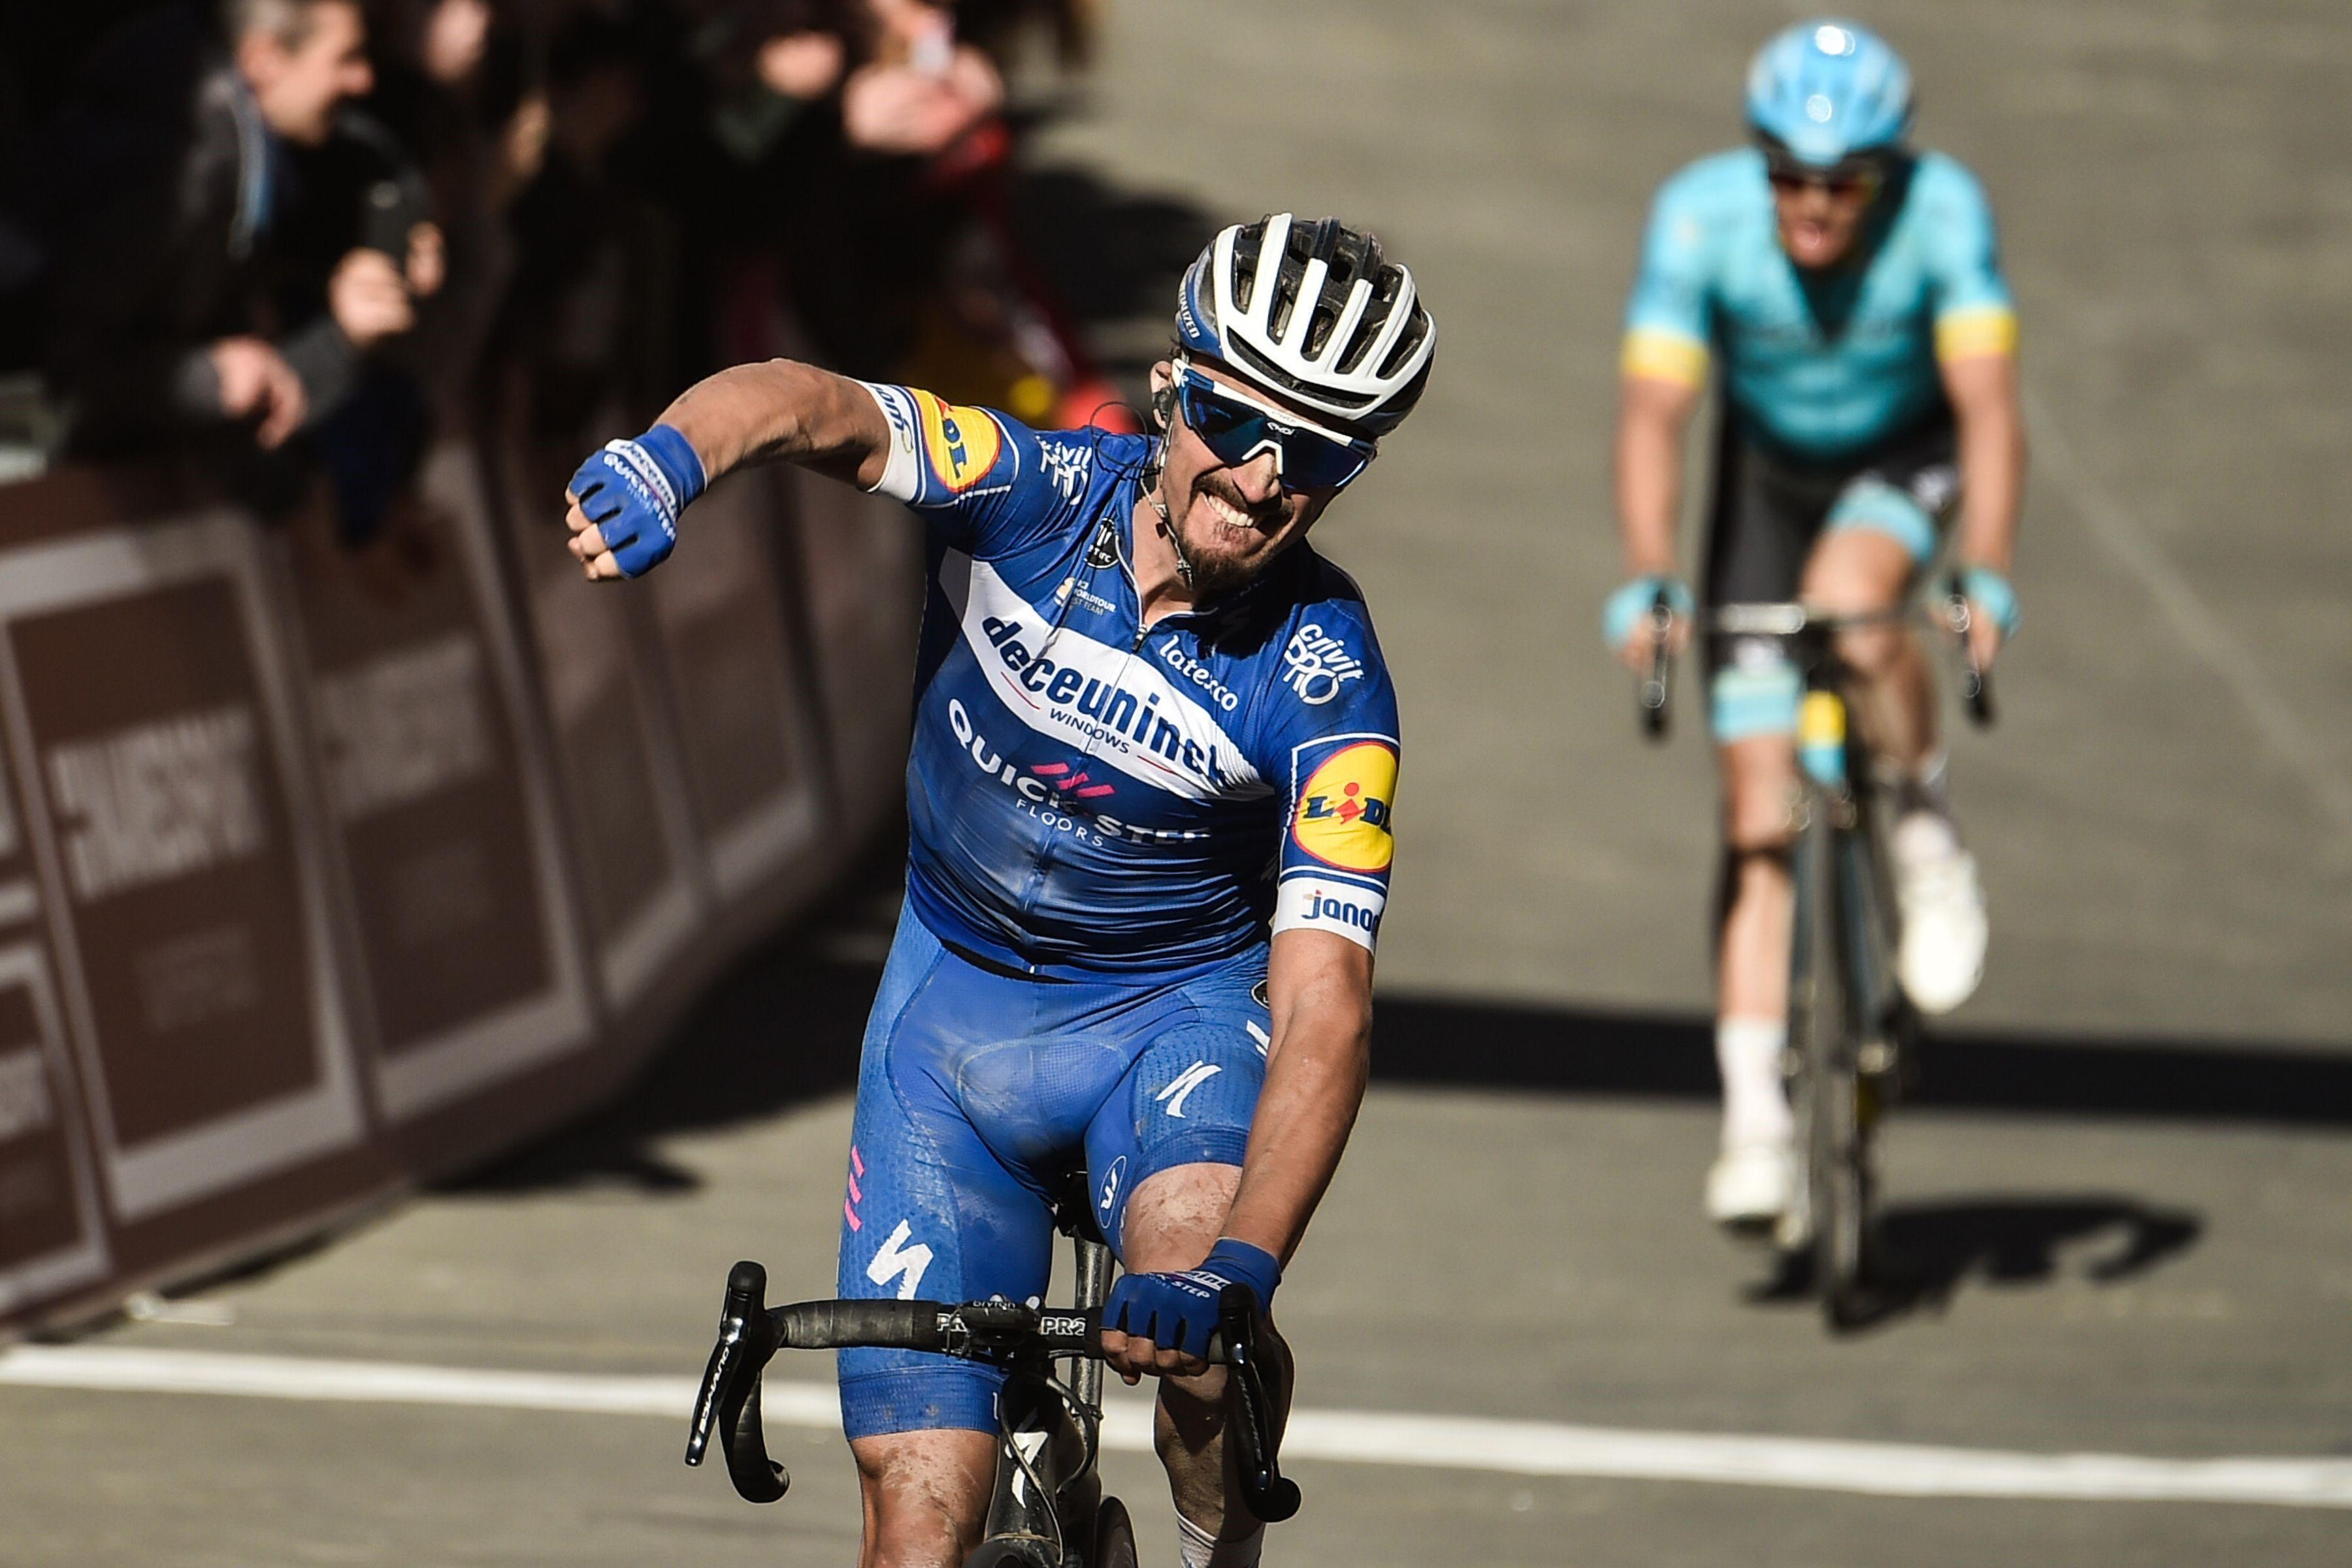 Julian Alaphilippe (Deceunink-Quick Step) s'impose sur les Strade Bianche devant Jakob Fuglsang (Astana)